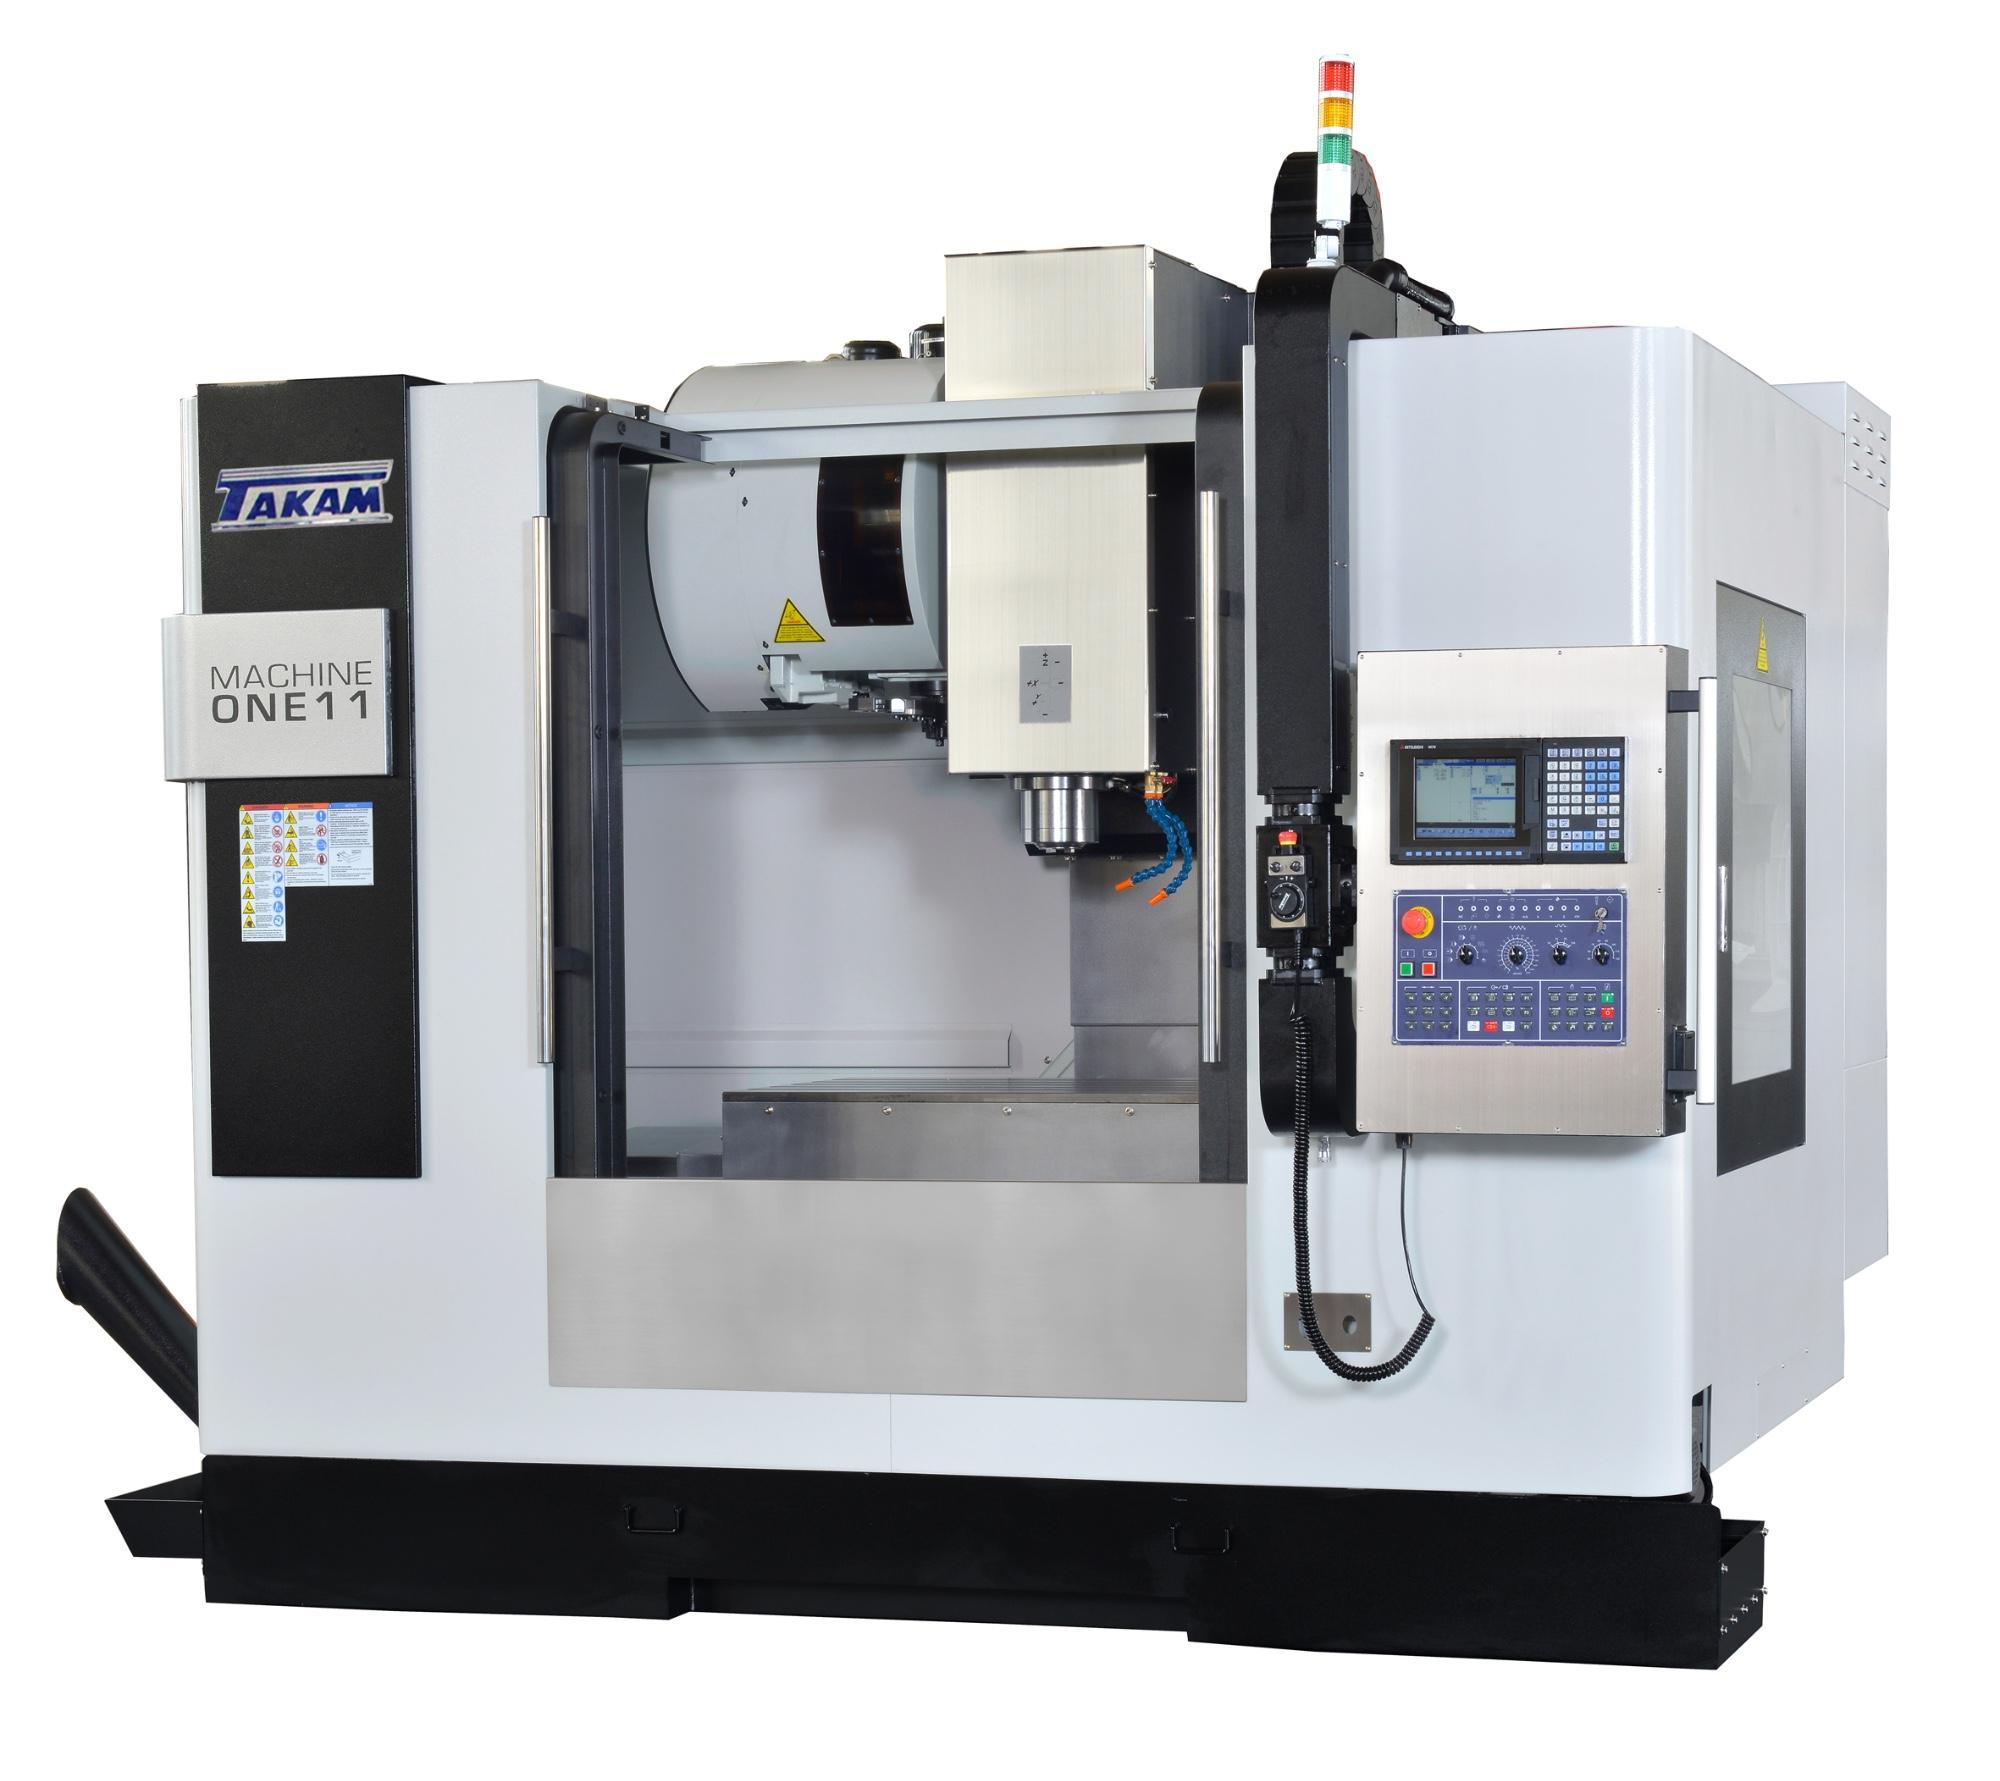 M-one 8 Premium 3 Axis Vertical Machine Center Manufacturers, M-one 8 Premium 3 Axis Vertical Machine Center Factory, Supply M-one 8 Premium 3 Axis Vertical Machine Center